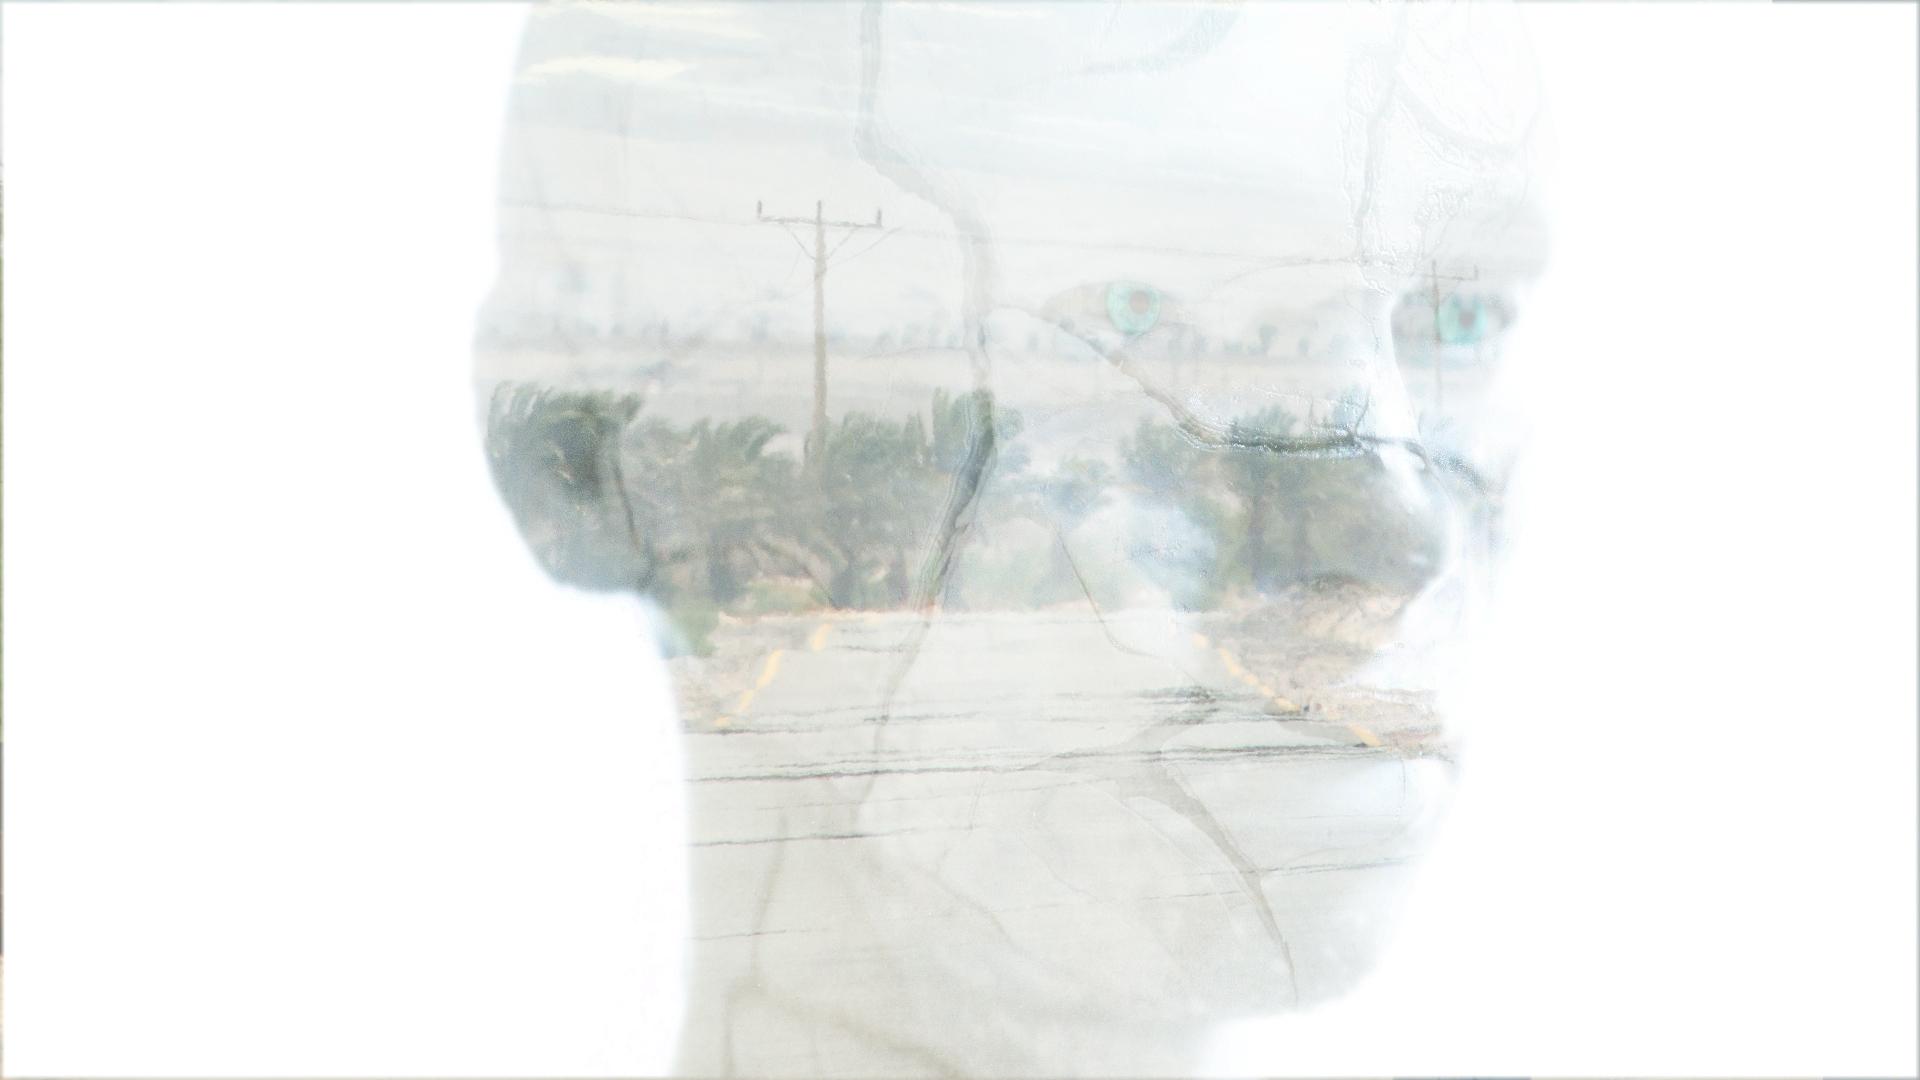 WOMAN_mapping_01.jpg